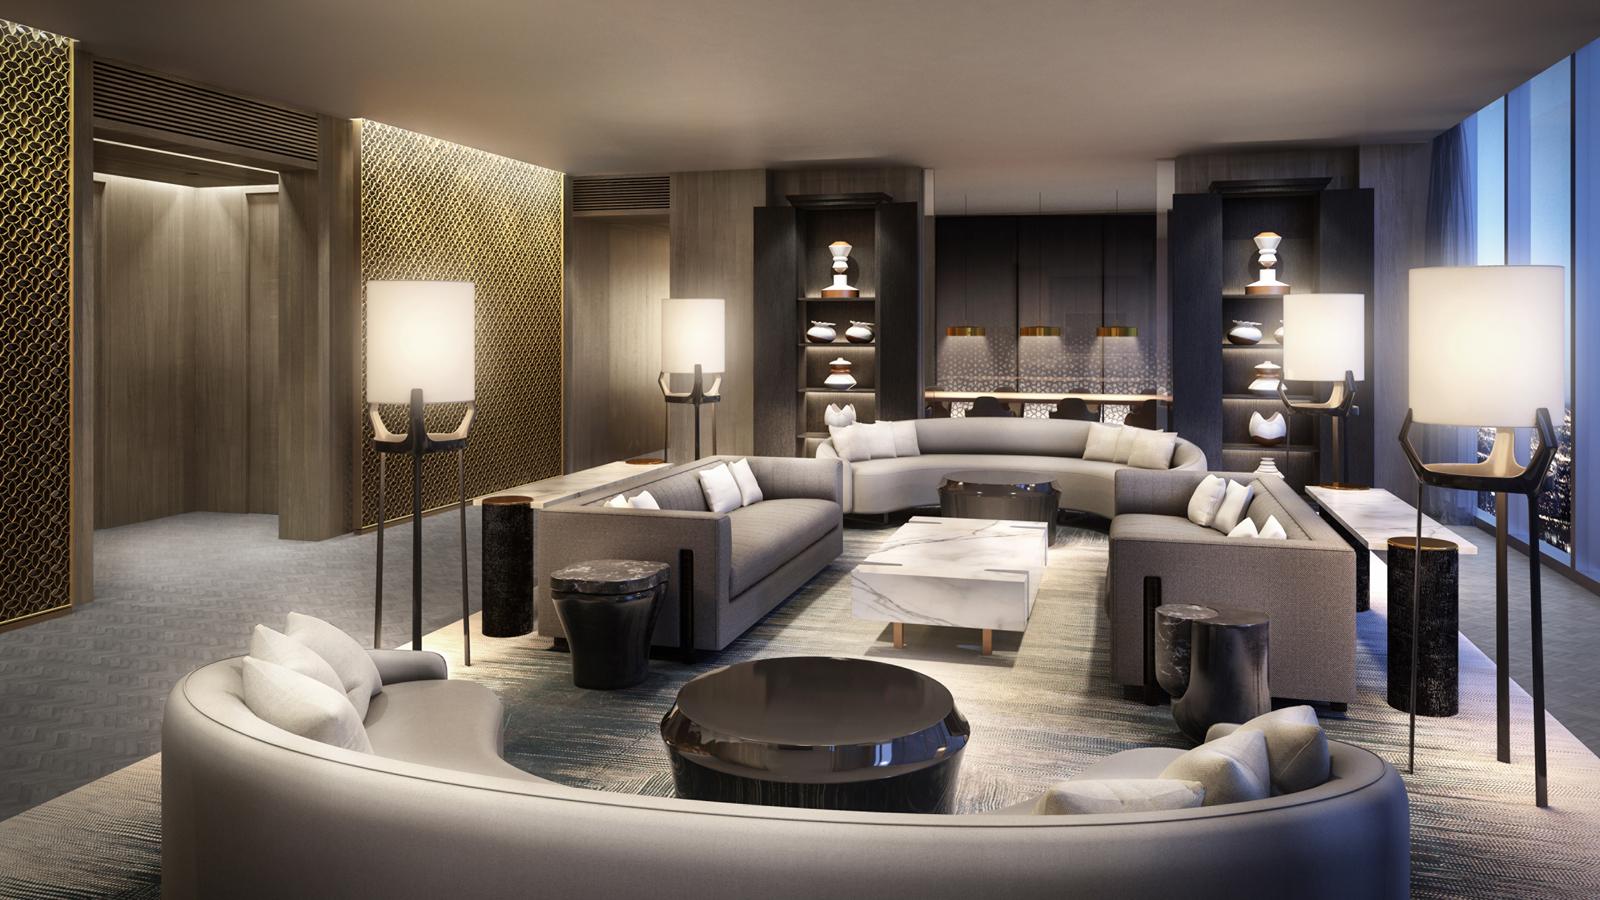 Four Seasons Hotel Kuwait At Burj Alshaya - Royal Suite